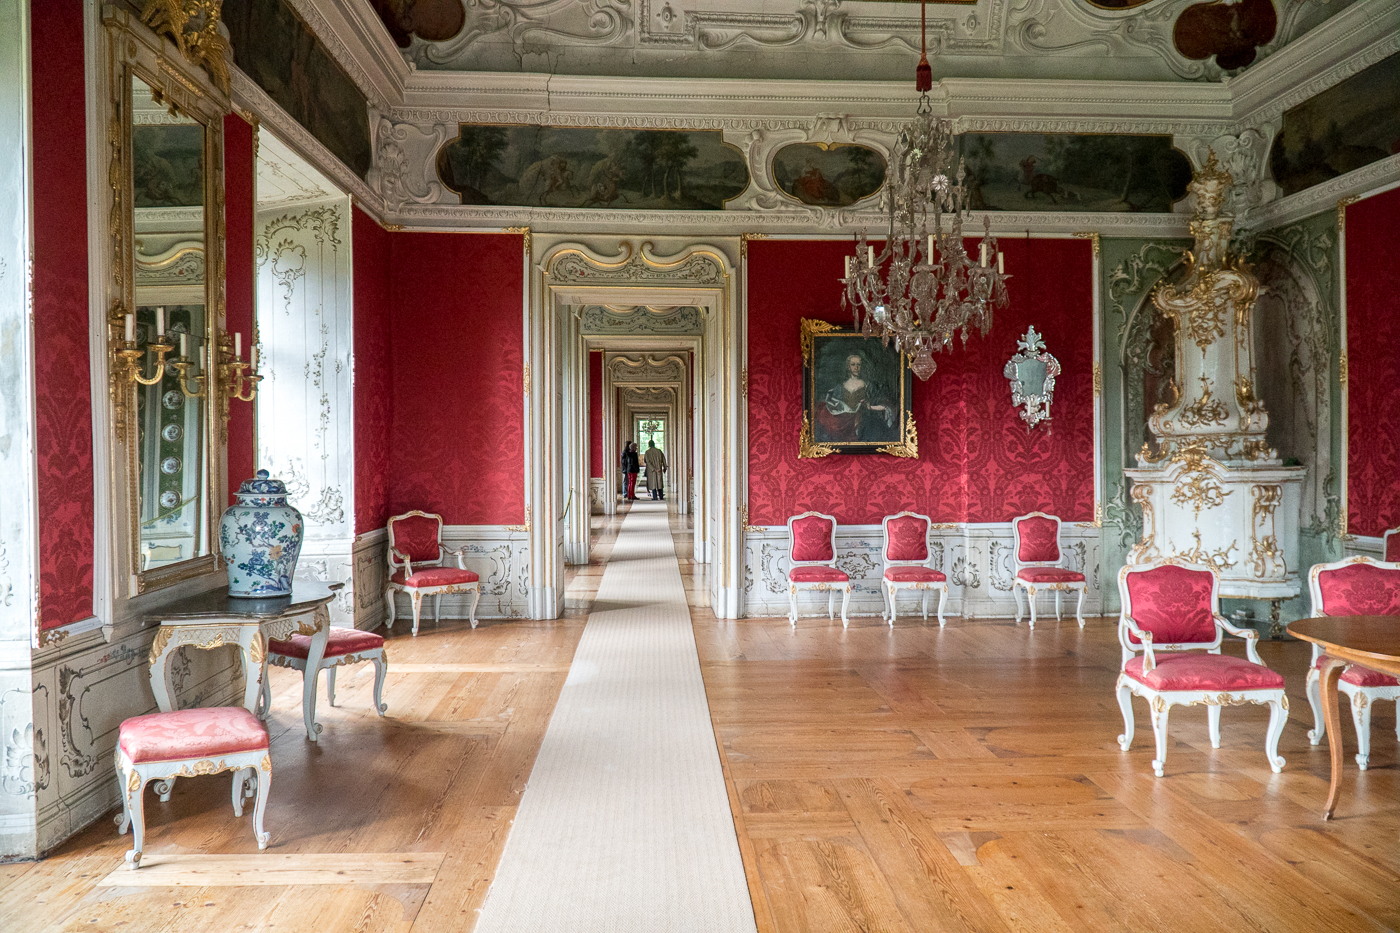 Couloir du château Schloss Eggenberg de Graz en Autriche